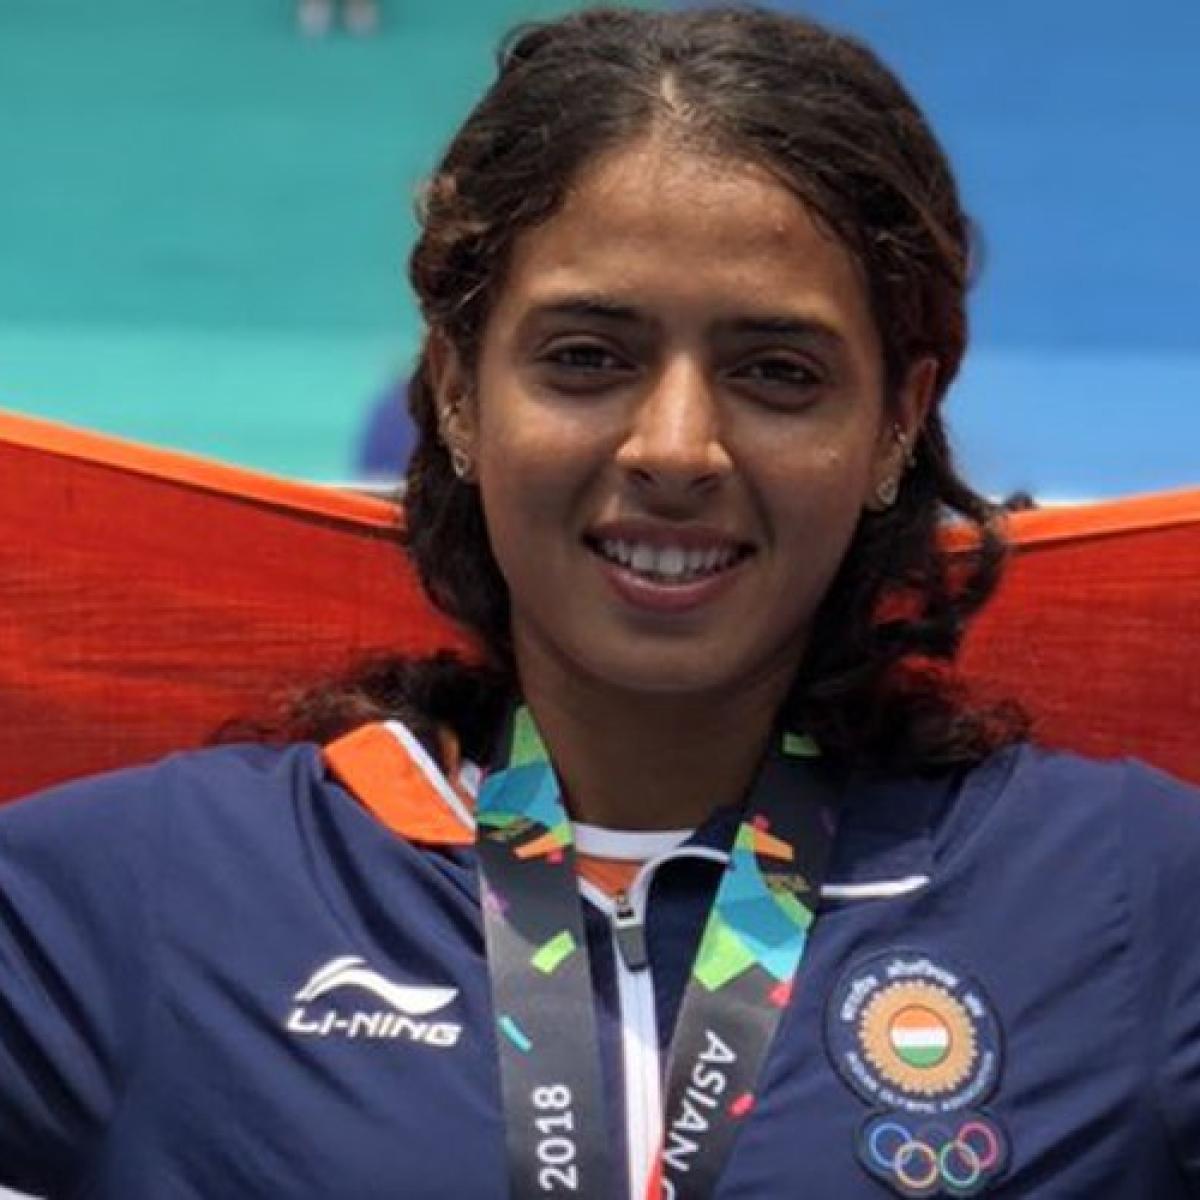 Australian Open: Ankita Raina becomes 3rd Indian woman to feature in Grand Slam main draw